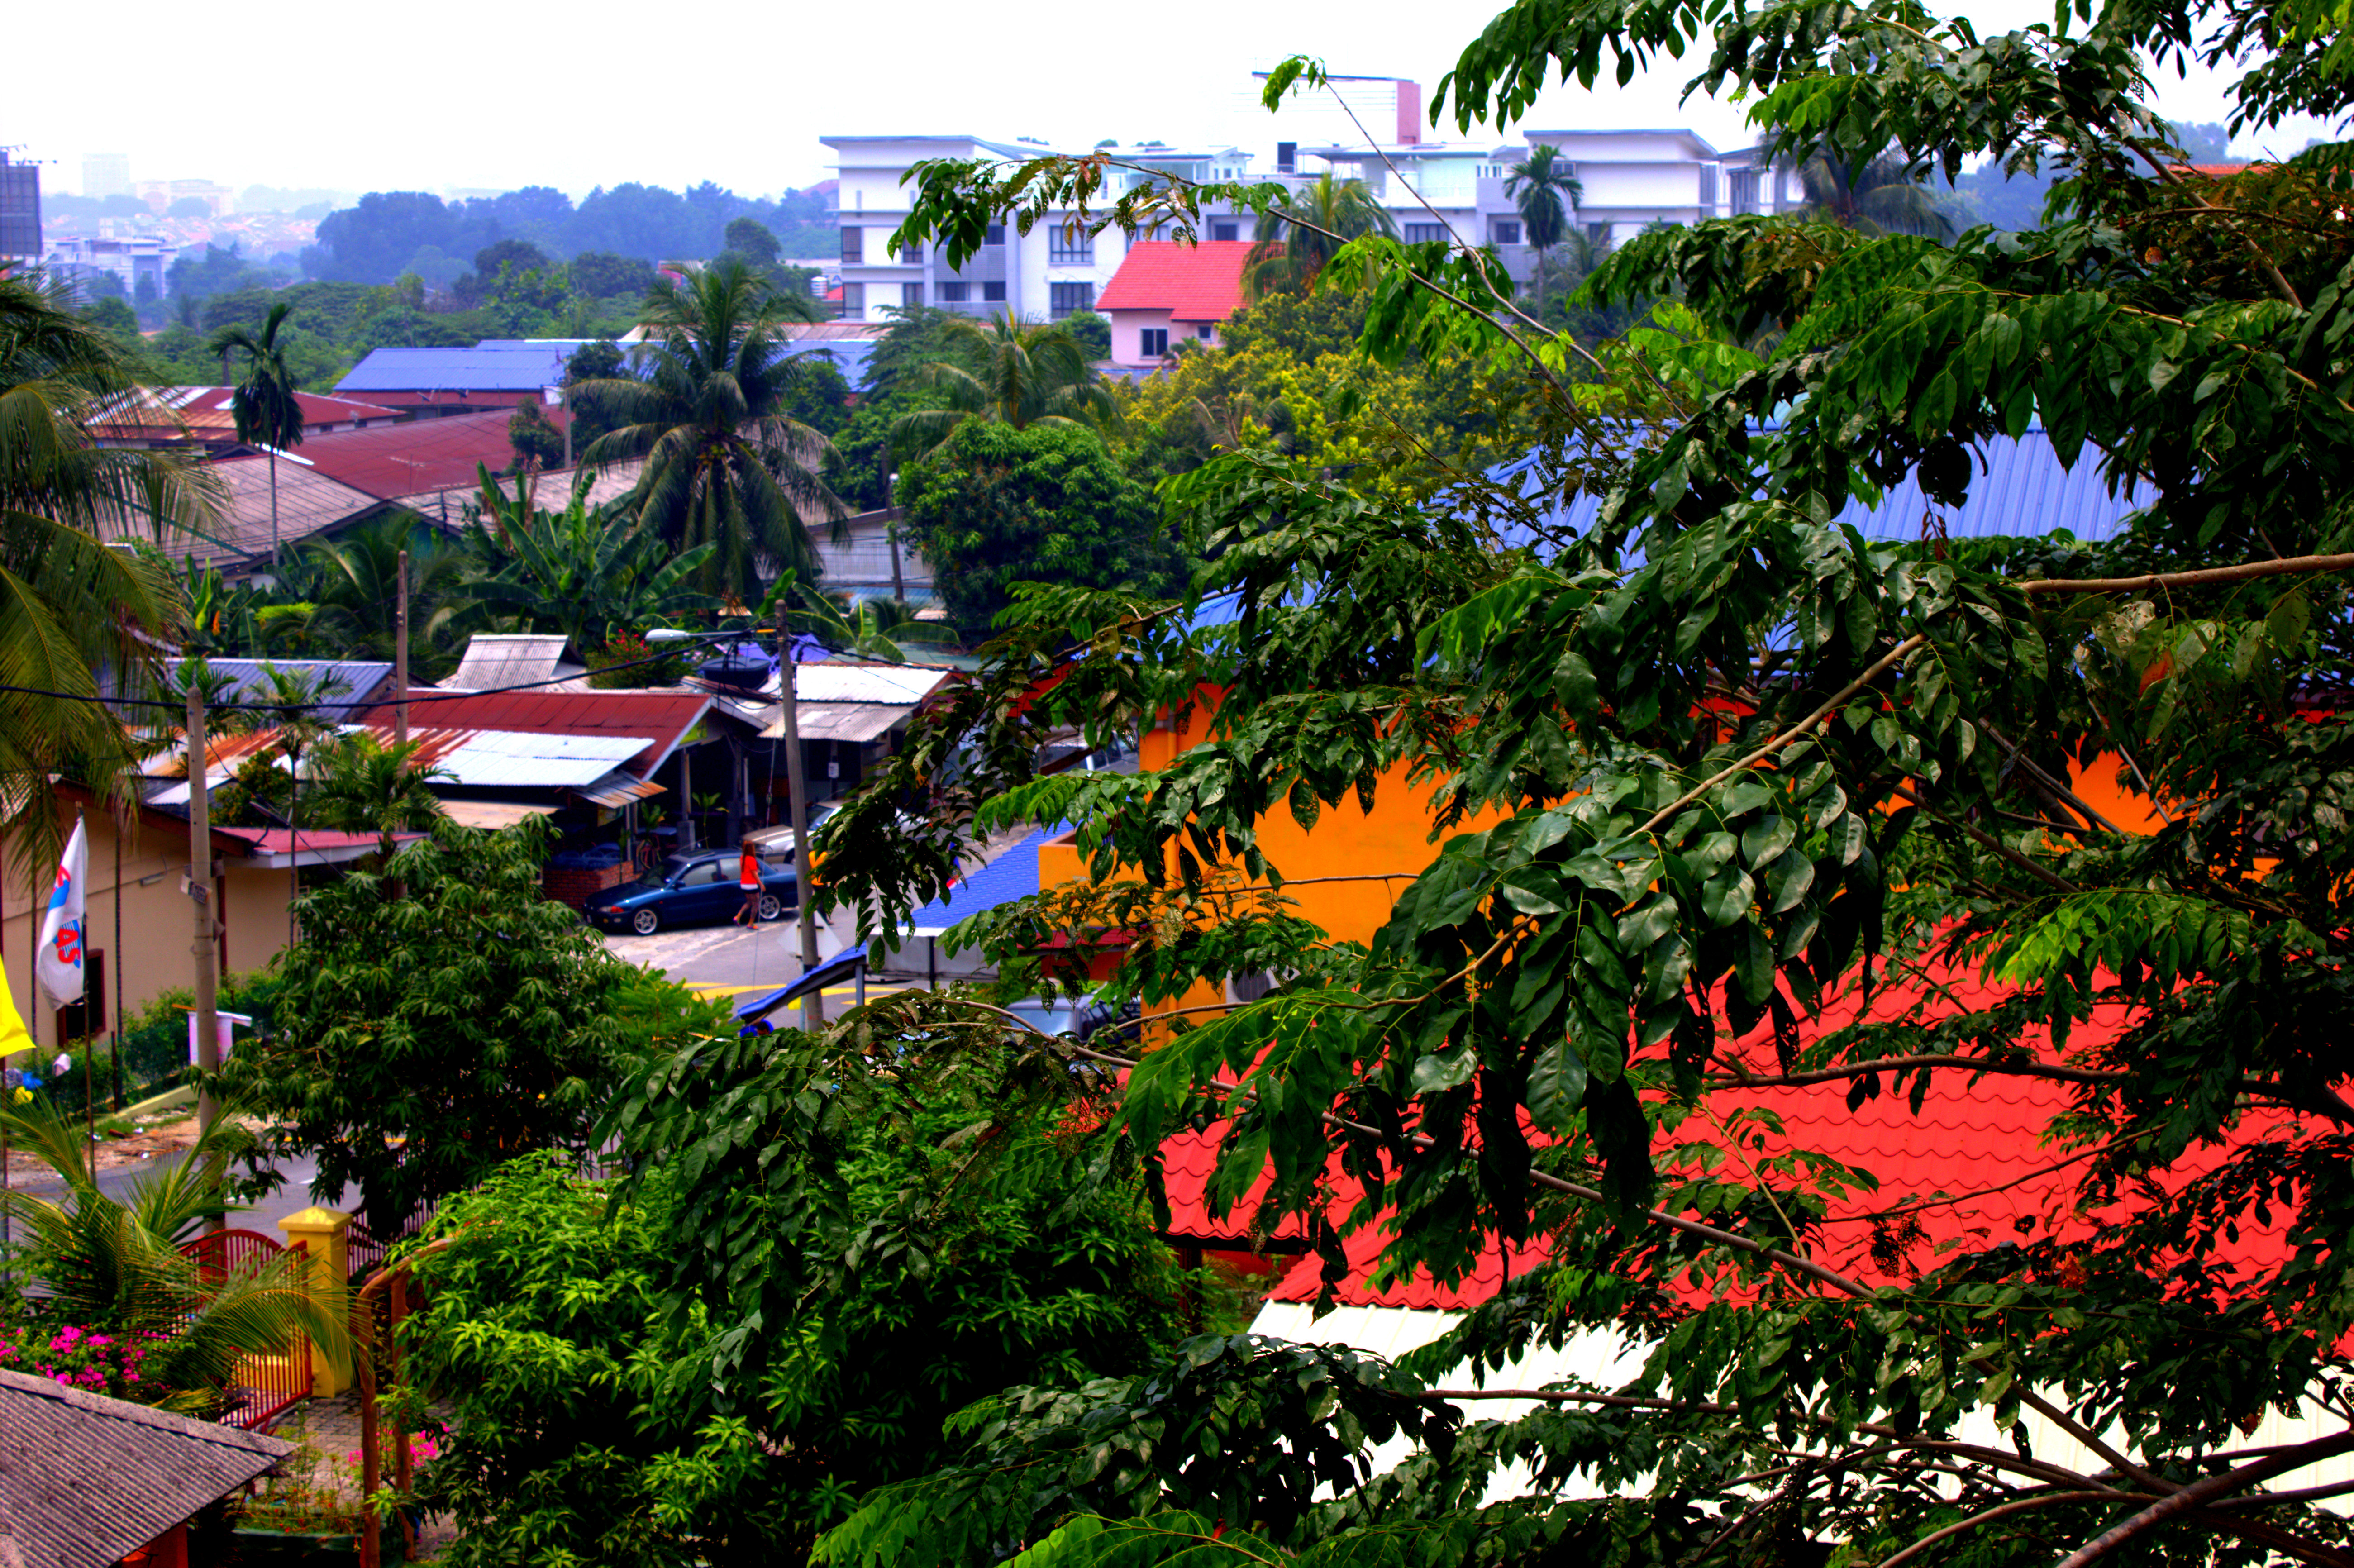 Malaysia - Blick aus dem Fenster